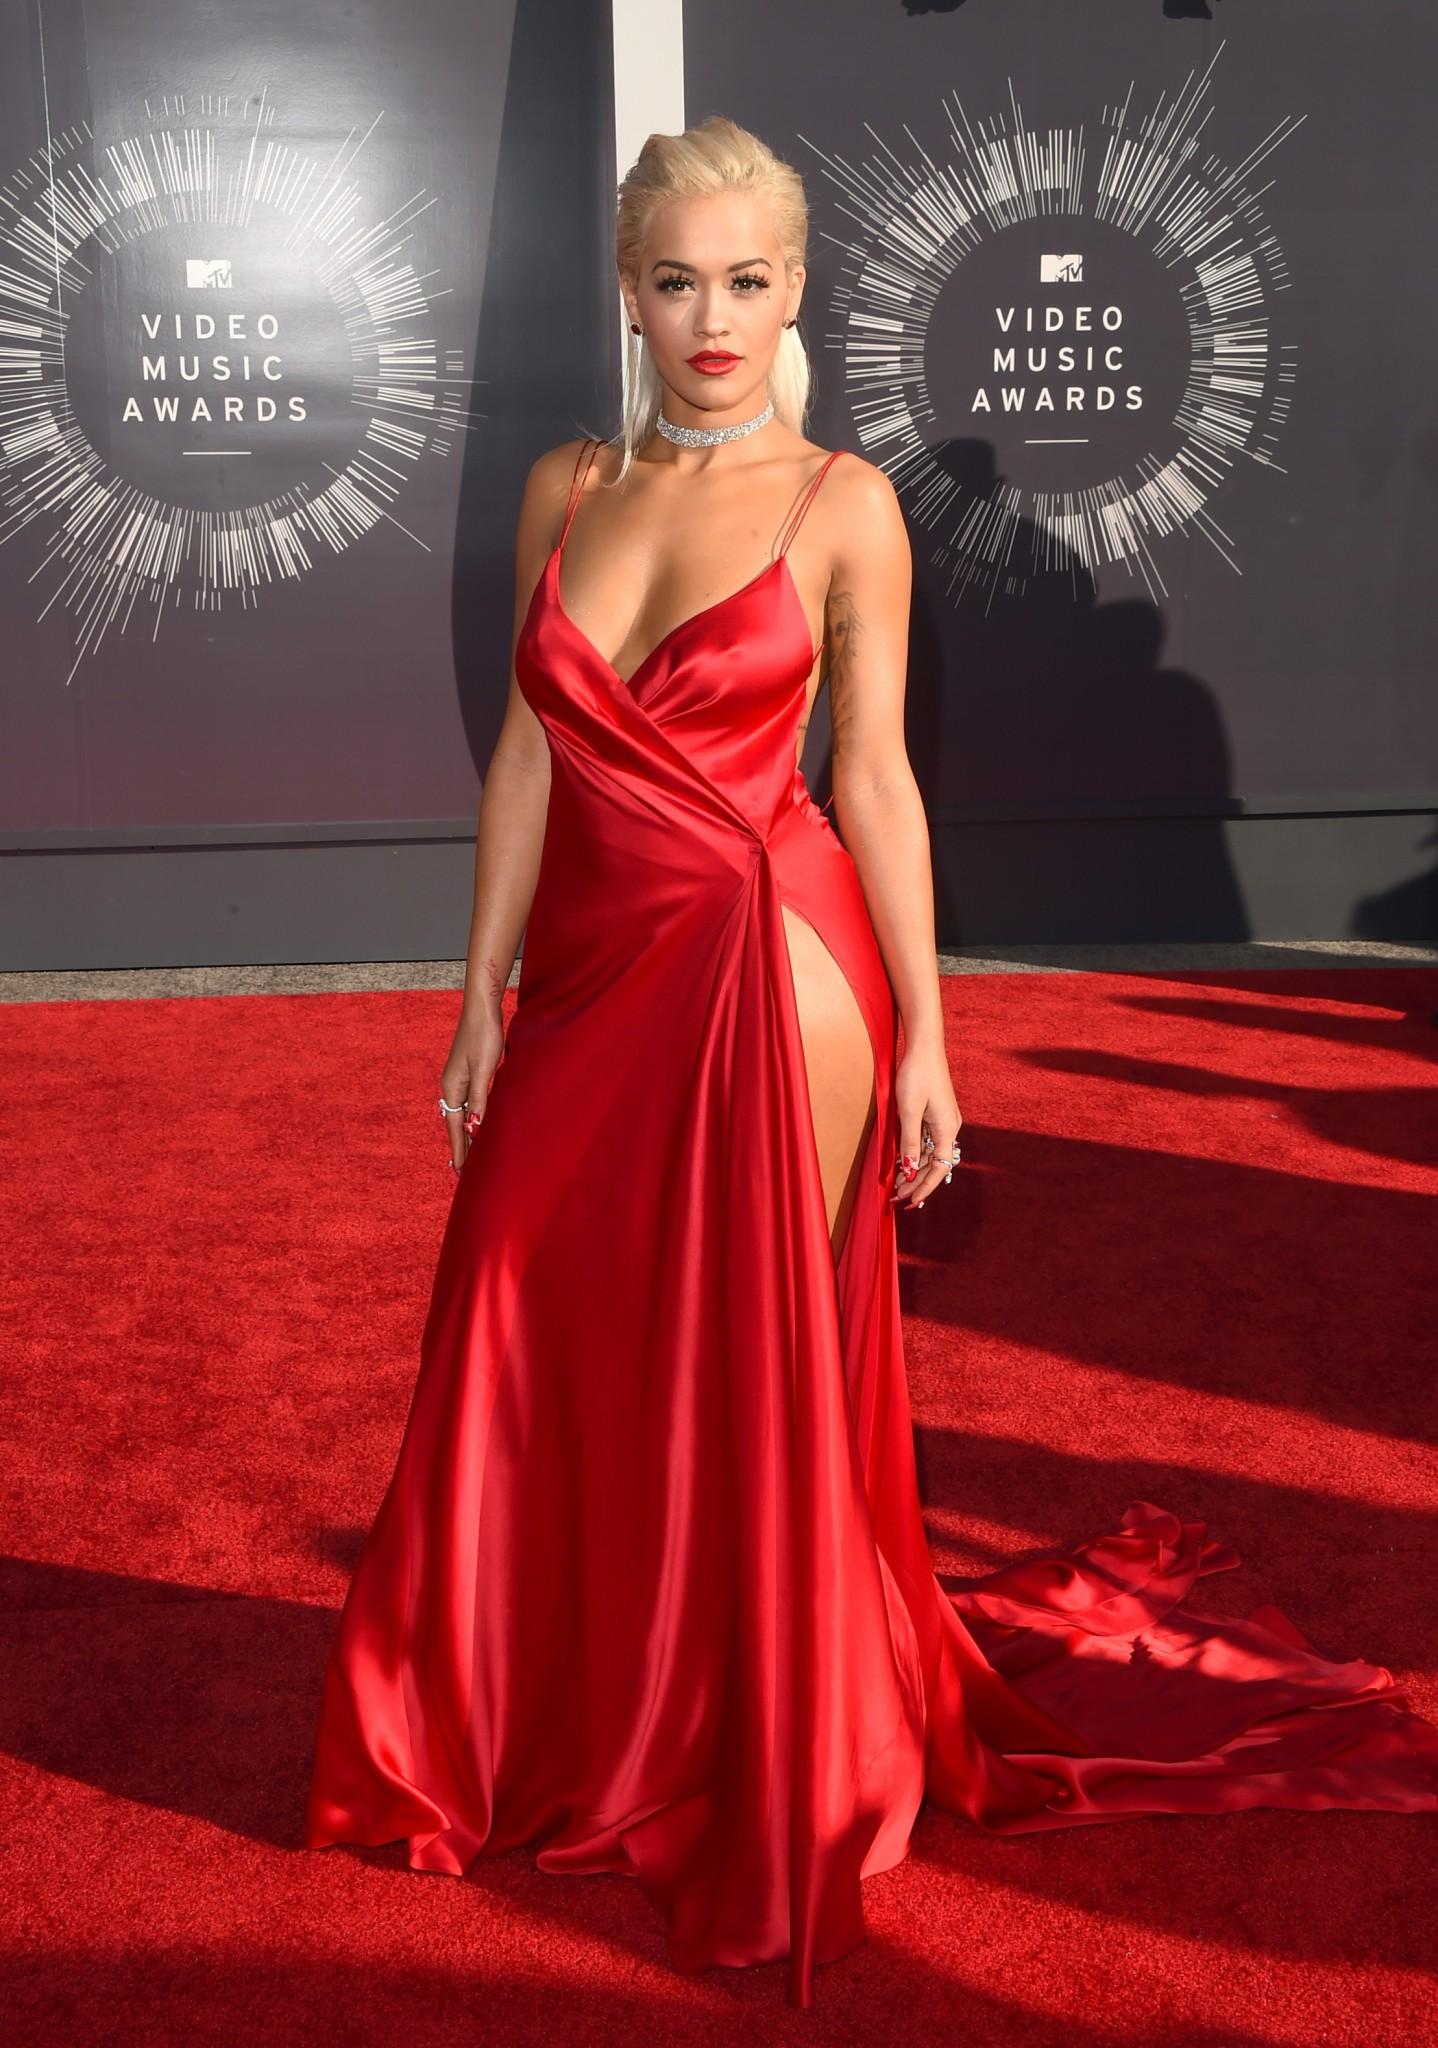 Rita Ora Braless Pokies On the Red Carpet | celebrity ...